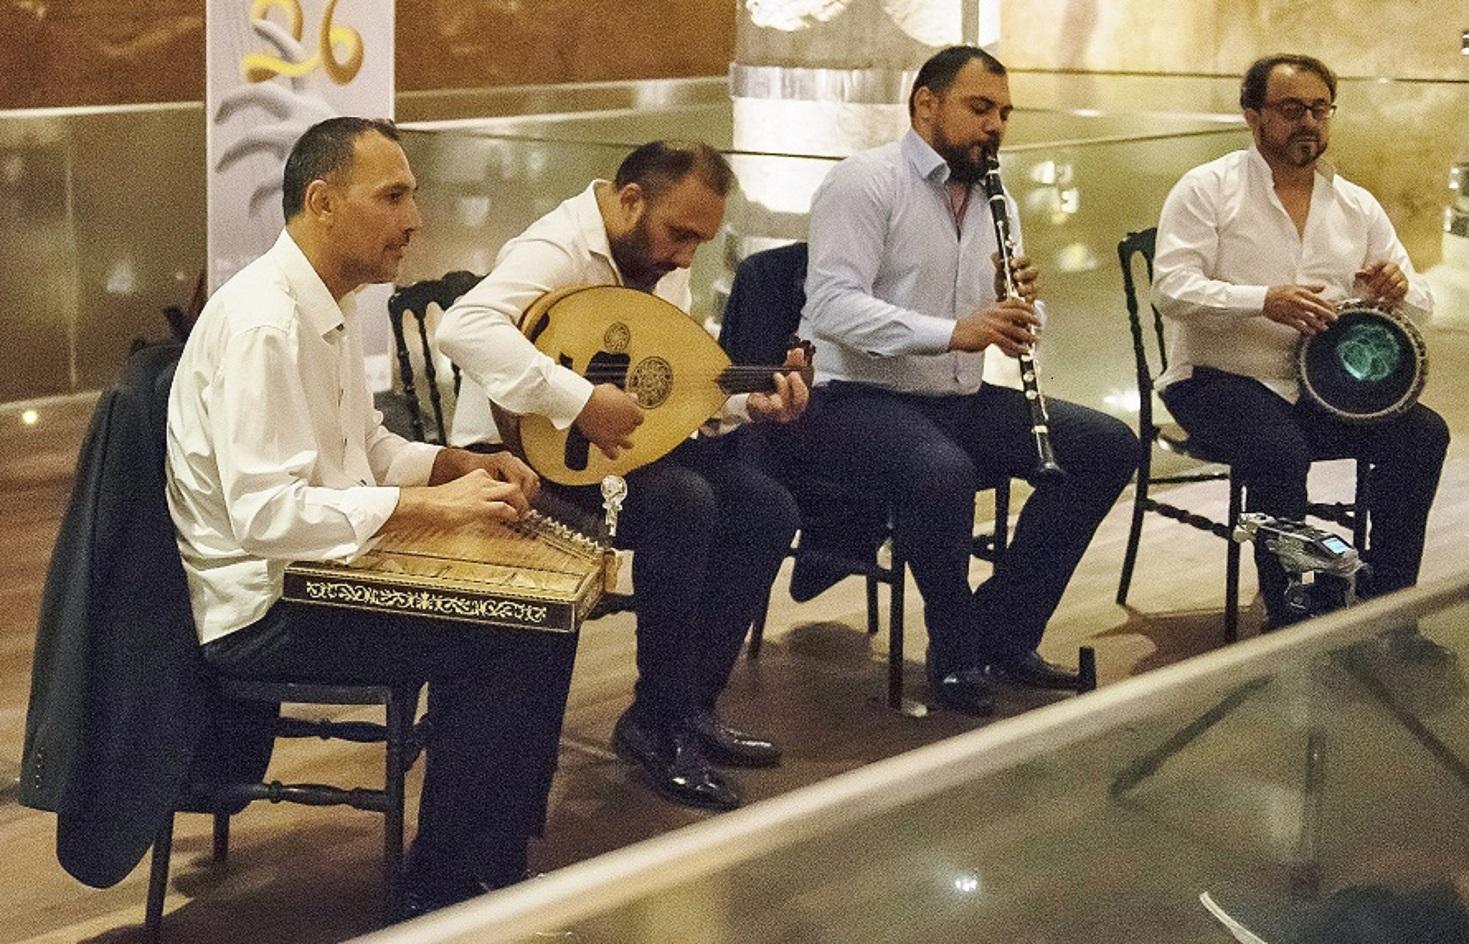 Ramazan Sesler Quartet